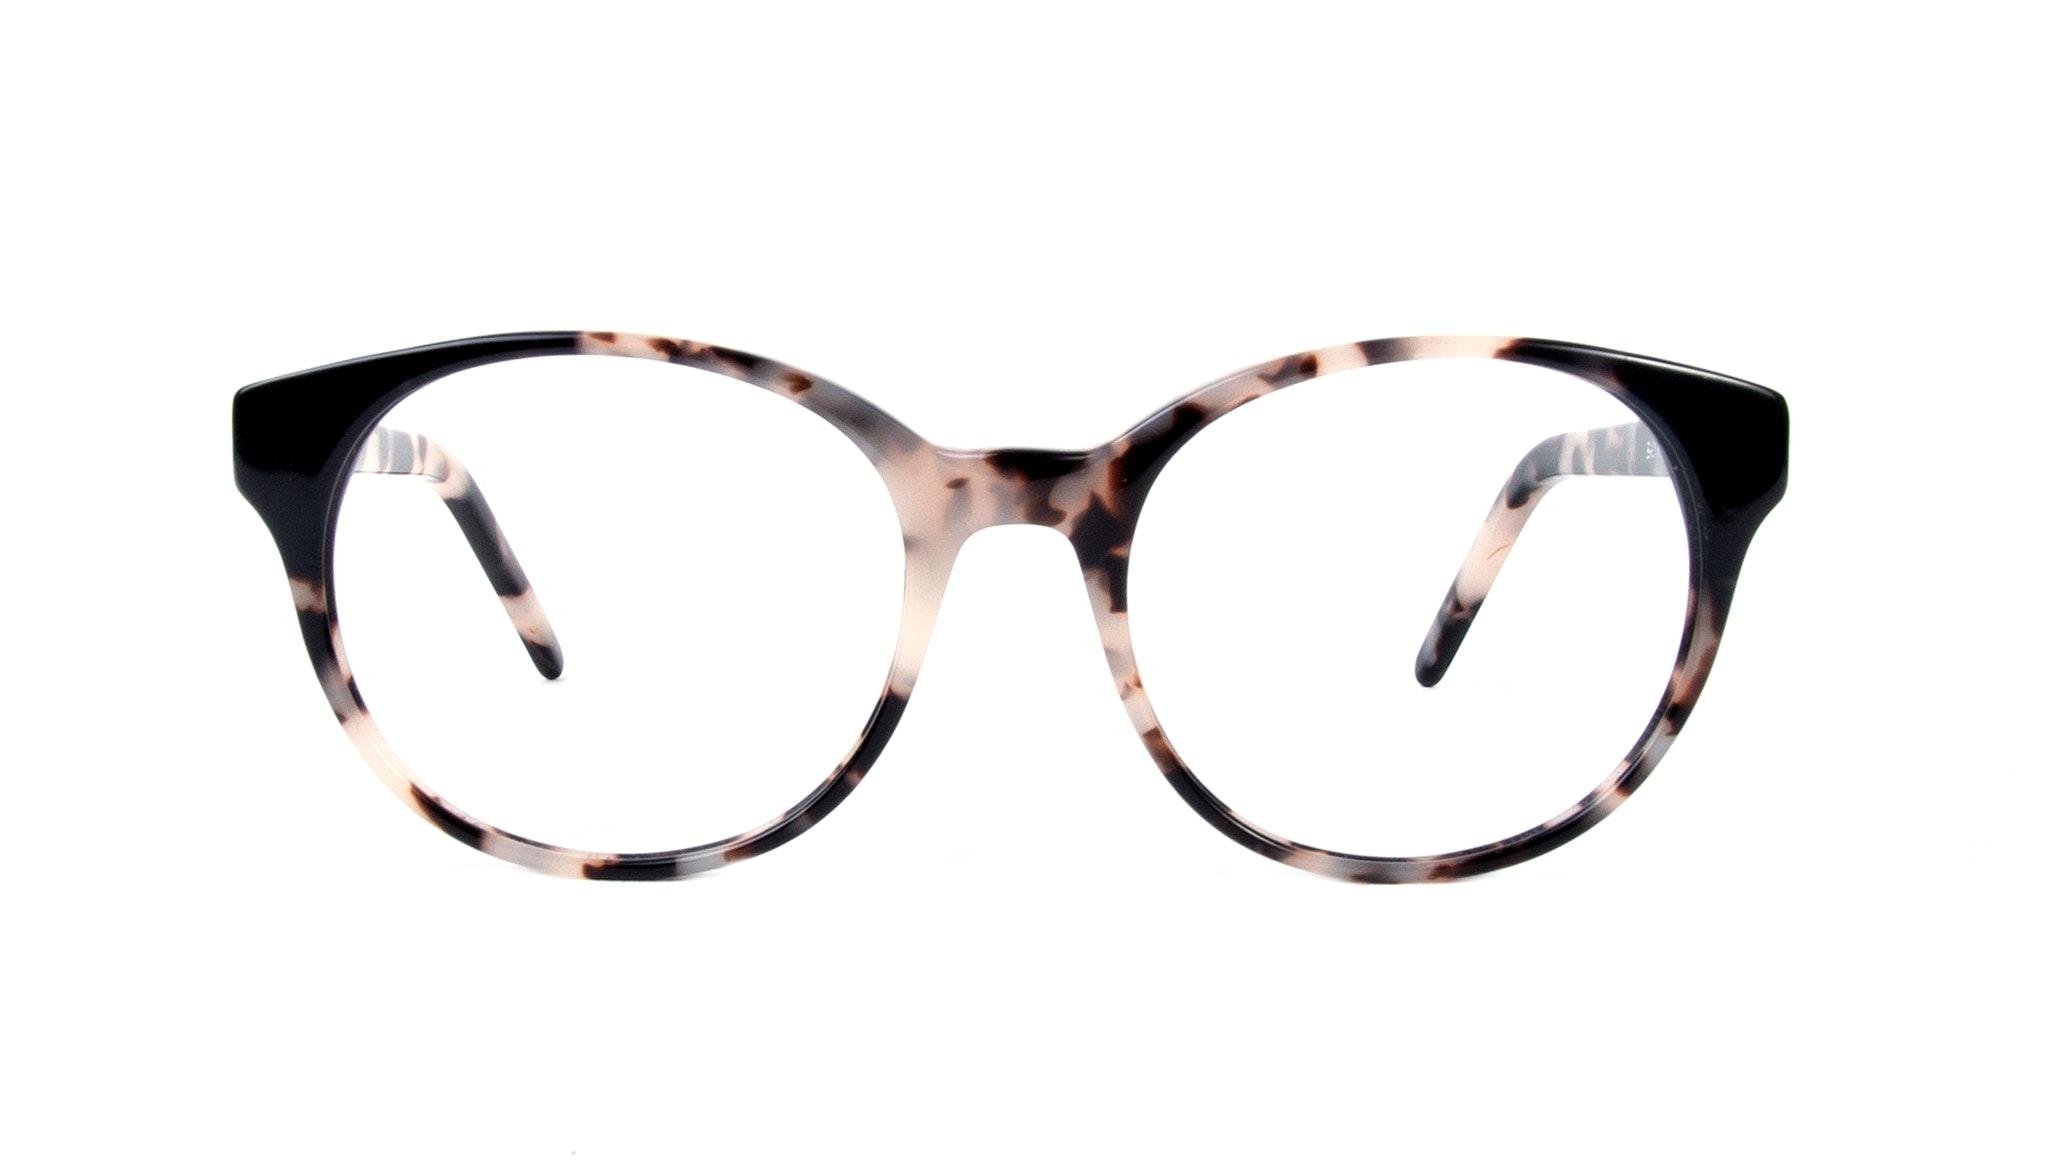 Affordable Fashion Glasses Round Eyeglasses Women Bis Granite Onyx Front